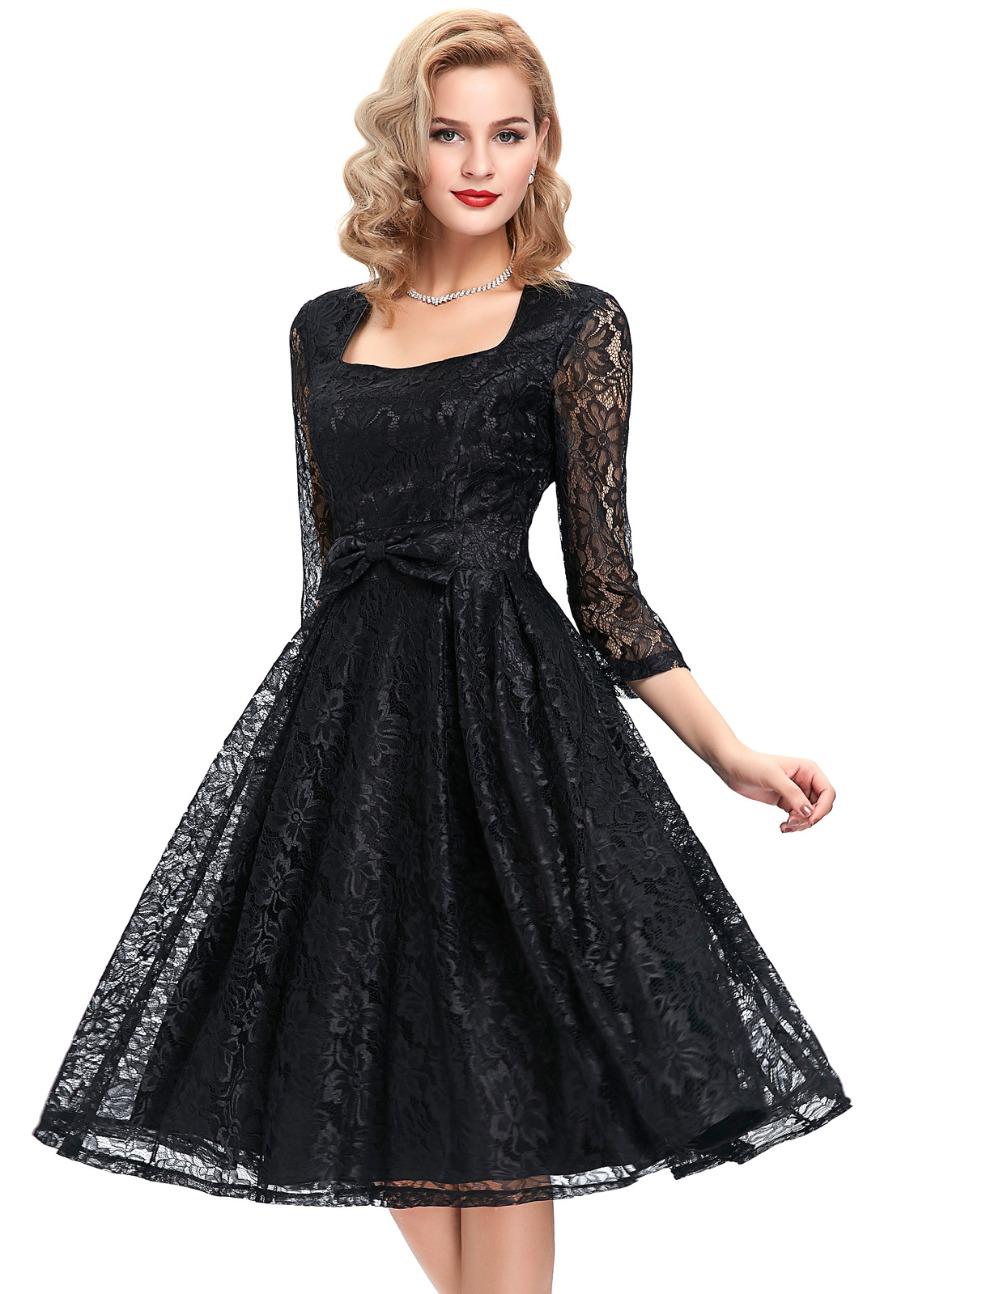 autumn 34 sleeve black lace women dresses 2016 retro